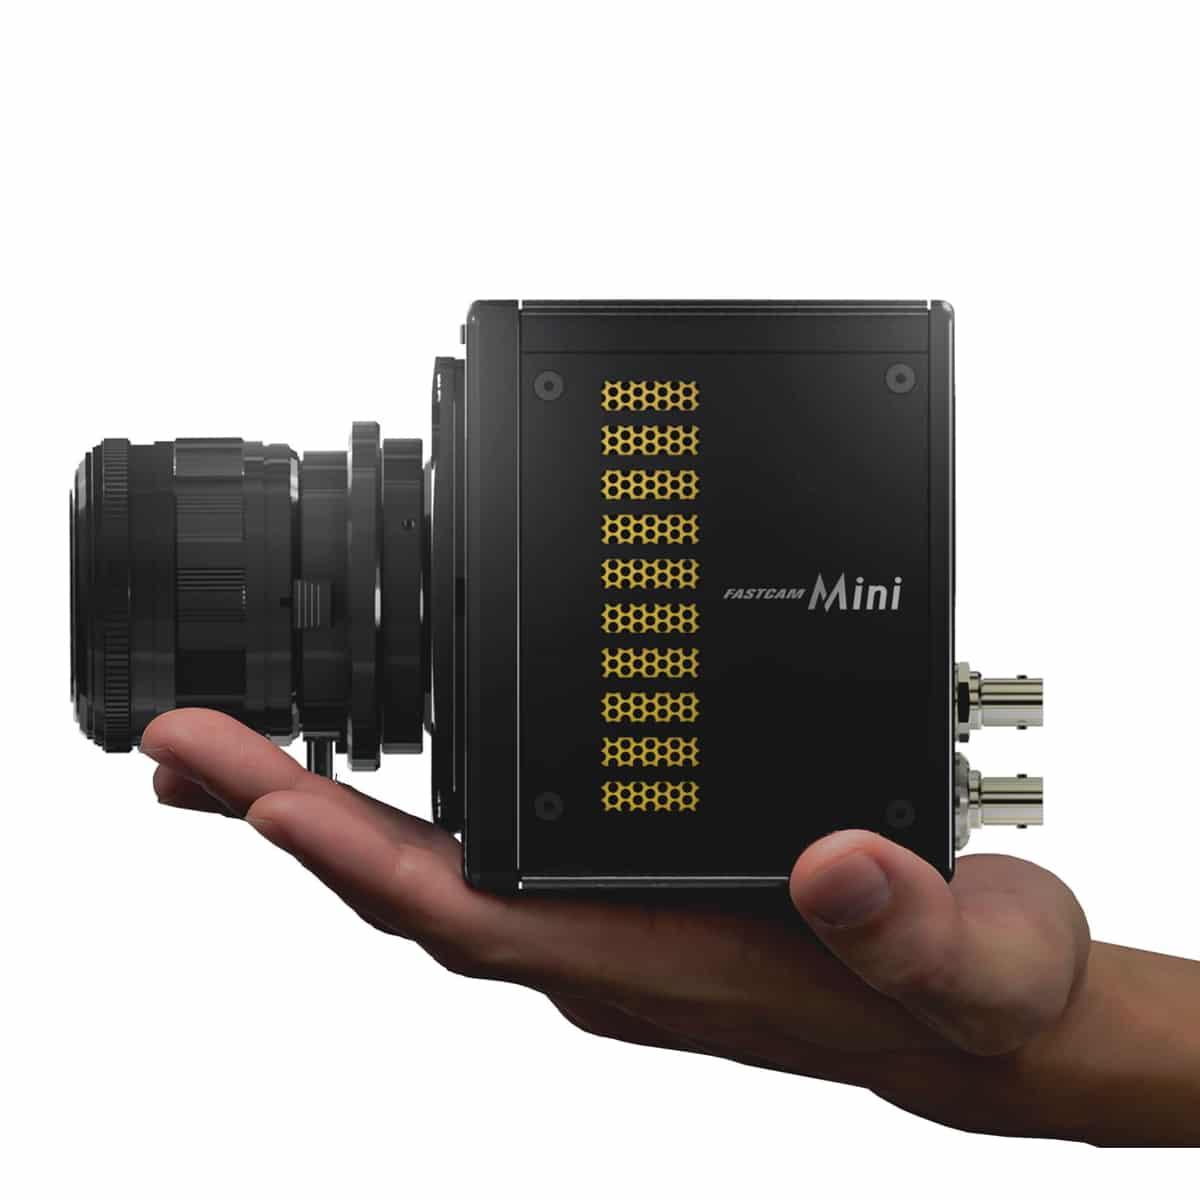 Photron FASTCAM Mini WX mit Hand